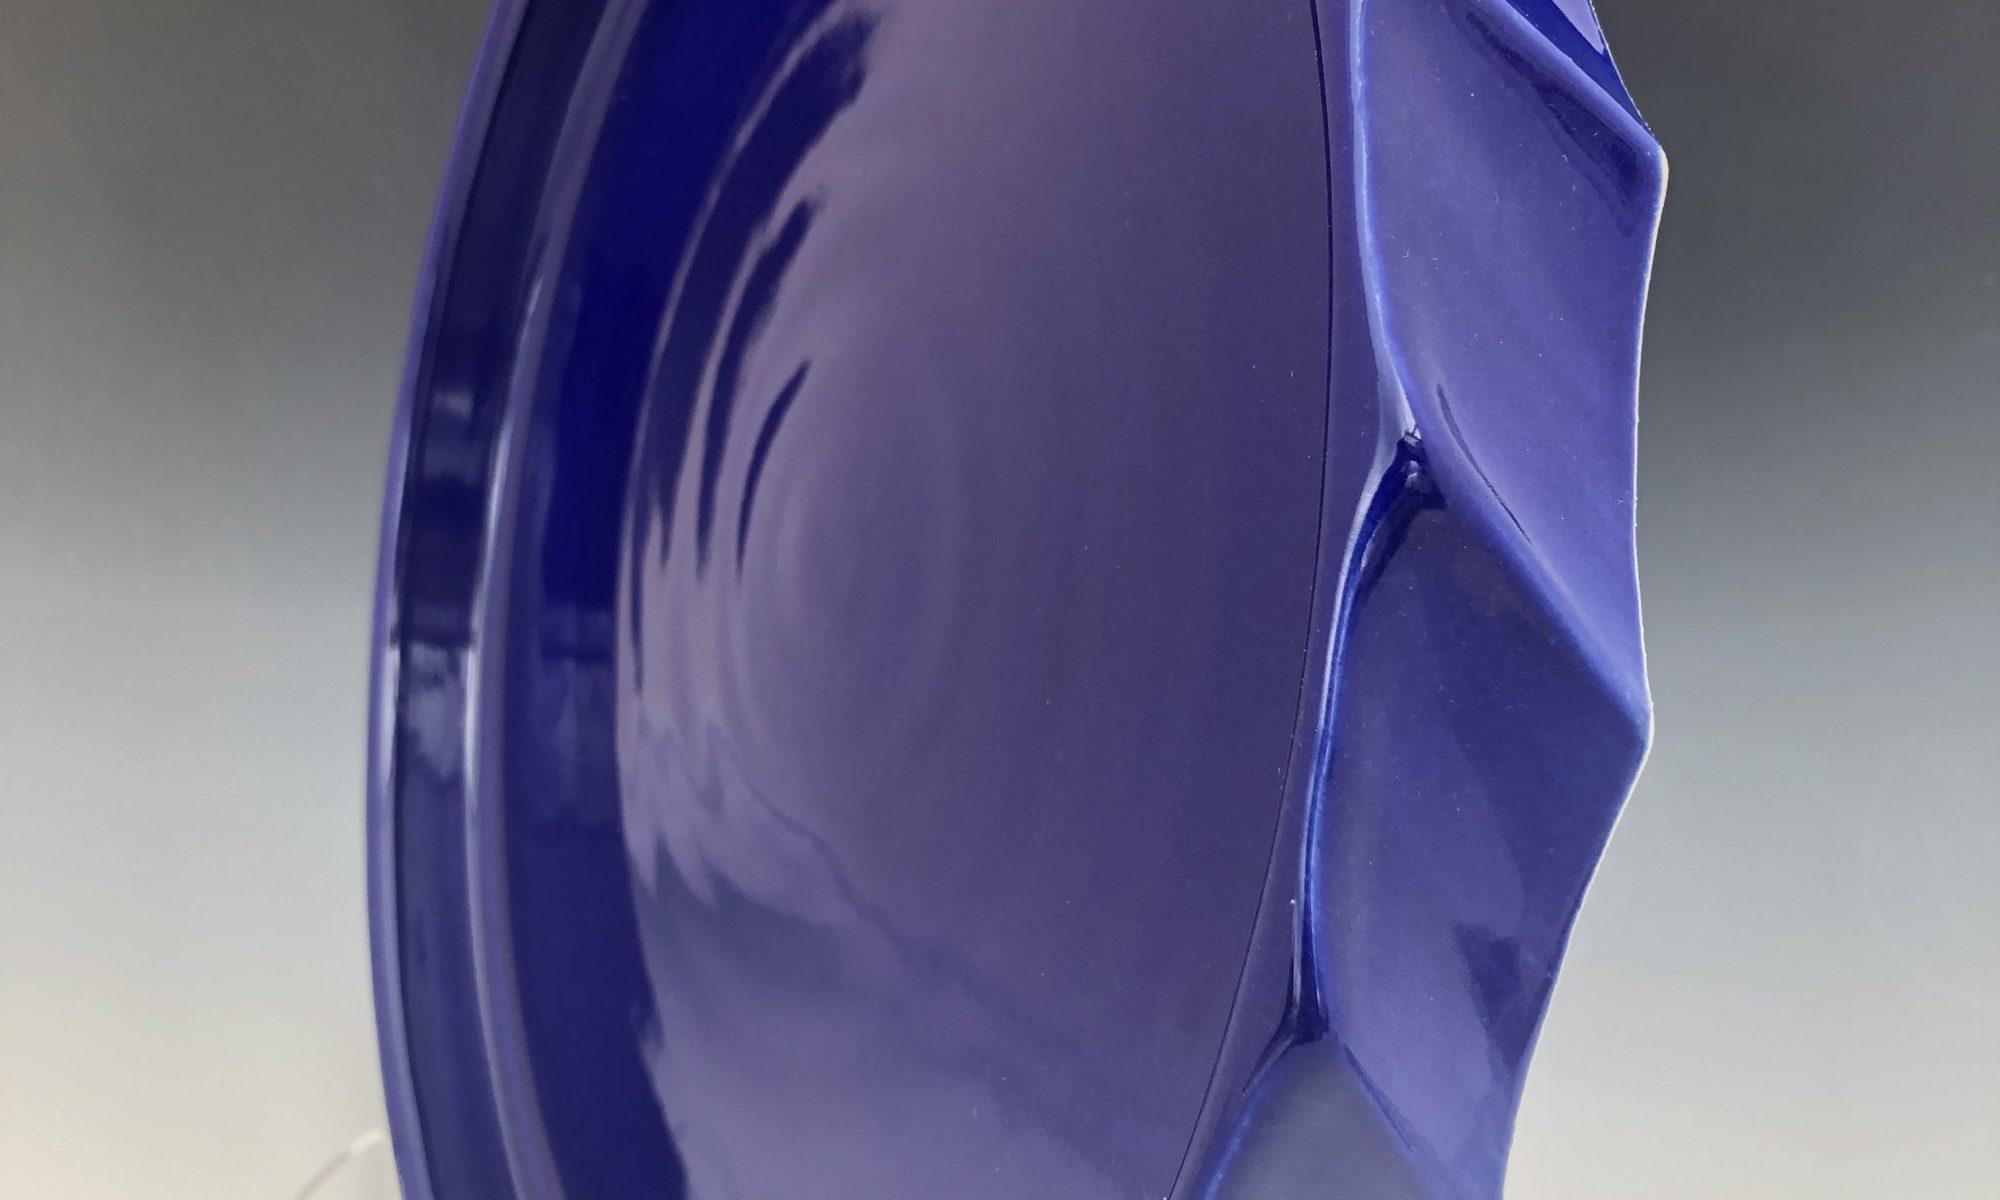 Royal blue platter created by Texan artist Stan Irvin